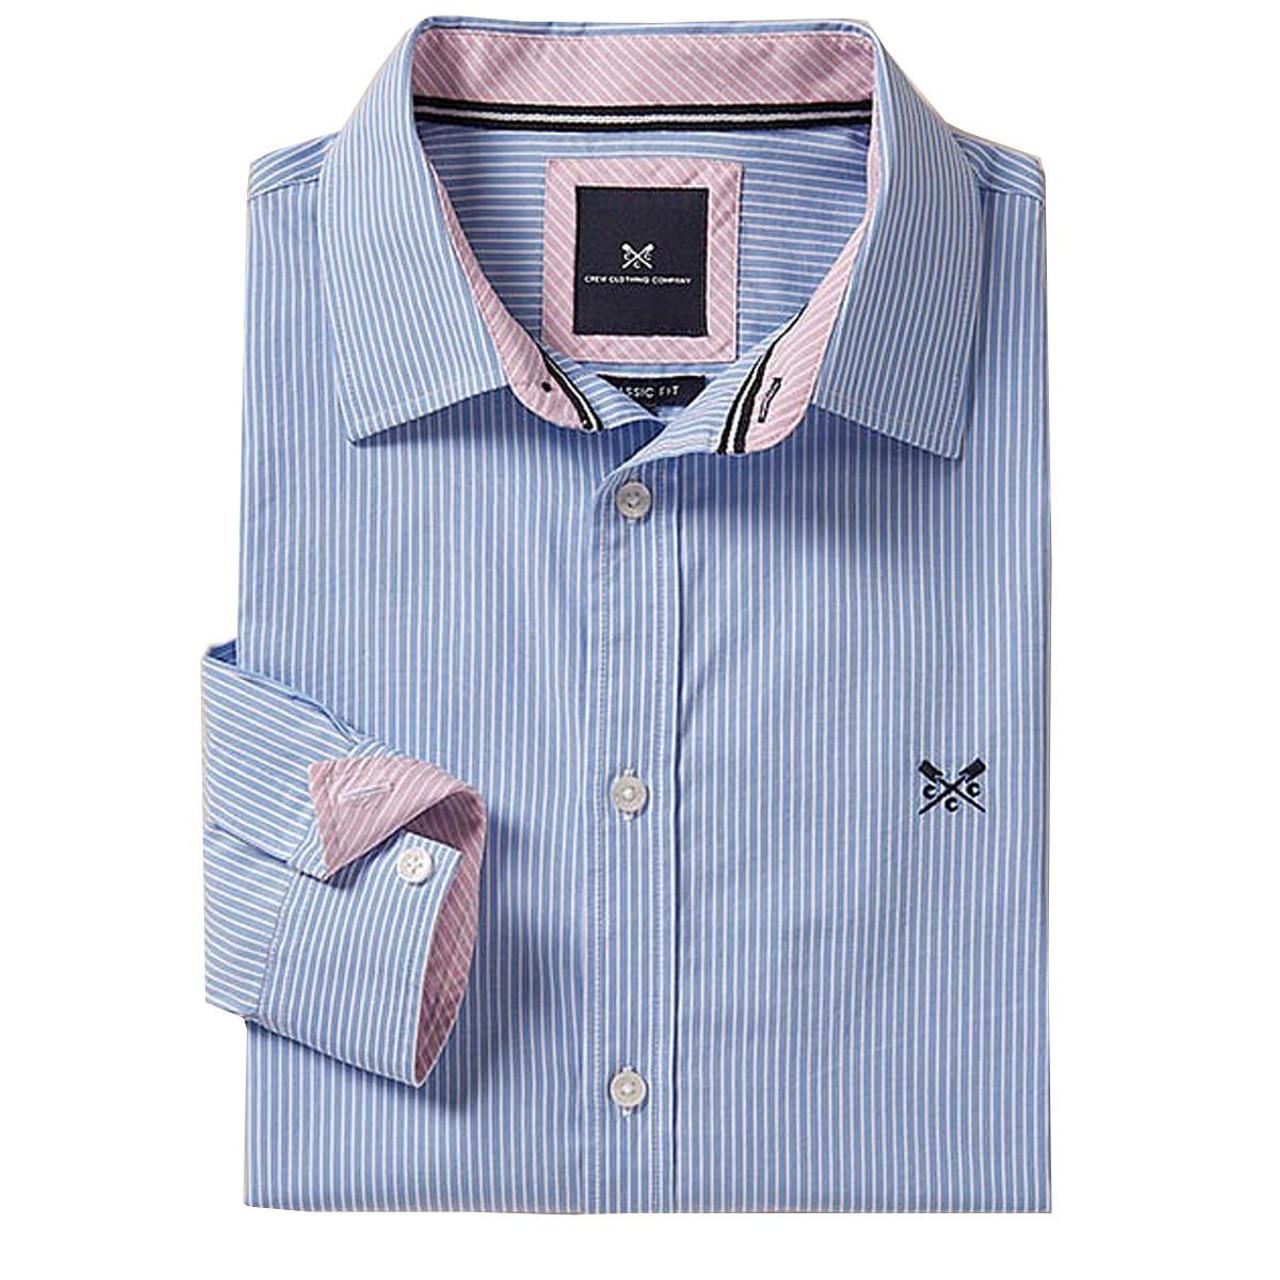 Crew Clothing Classic Micro Stripe Shirt